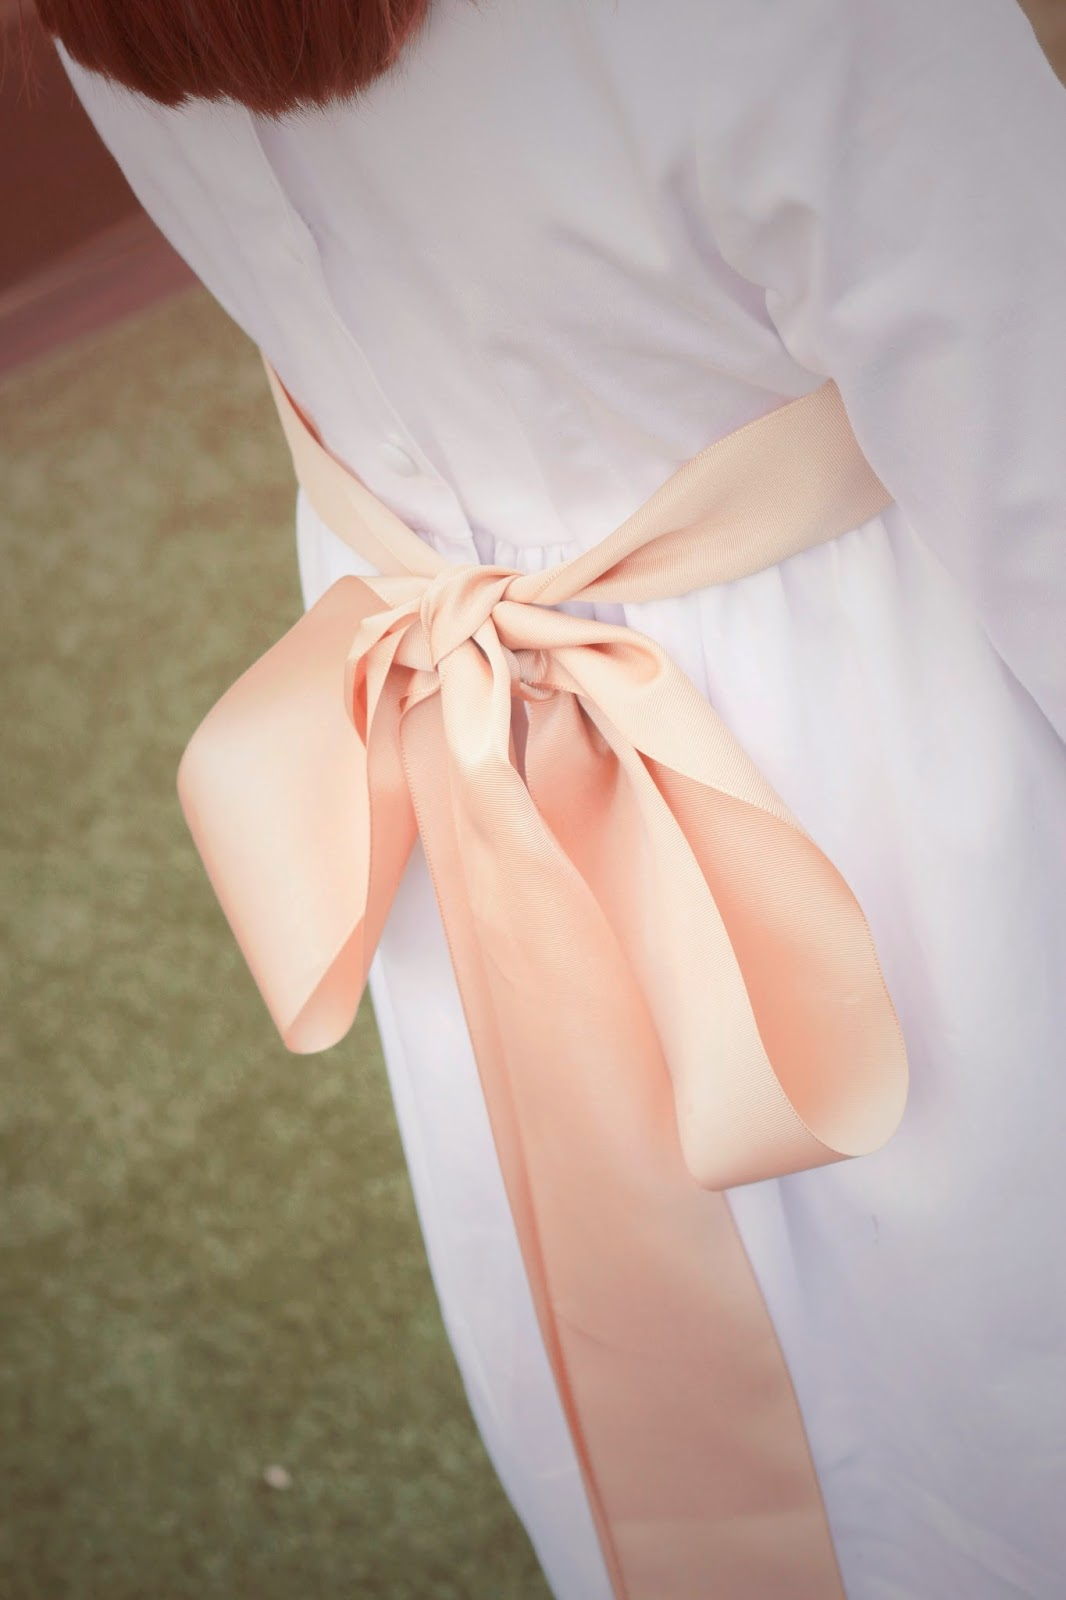 photo-detalles-comunion-vestido-blanco-detalle-nude